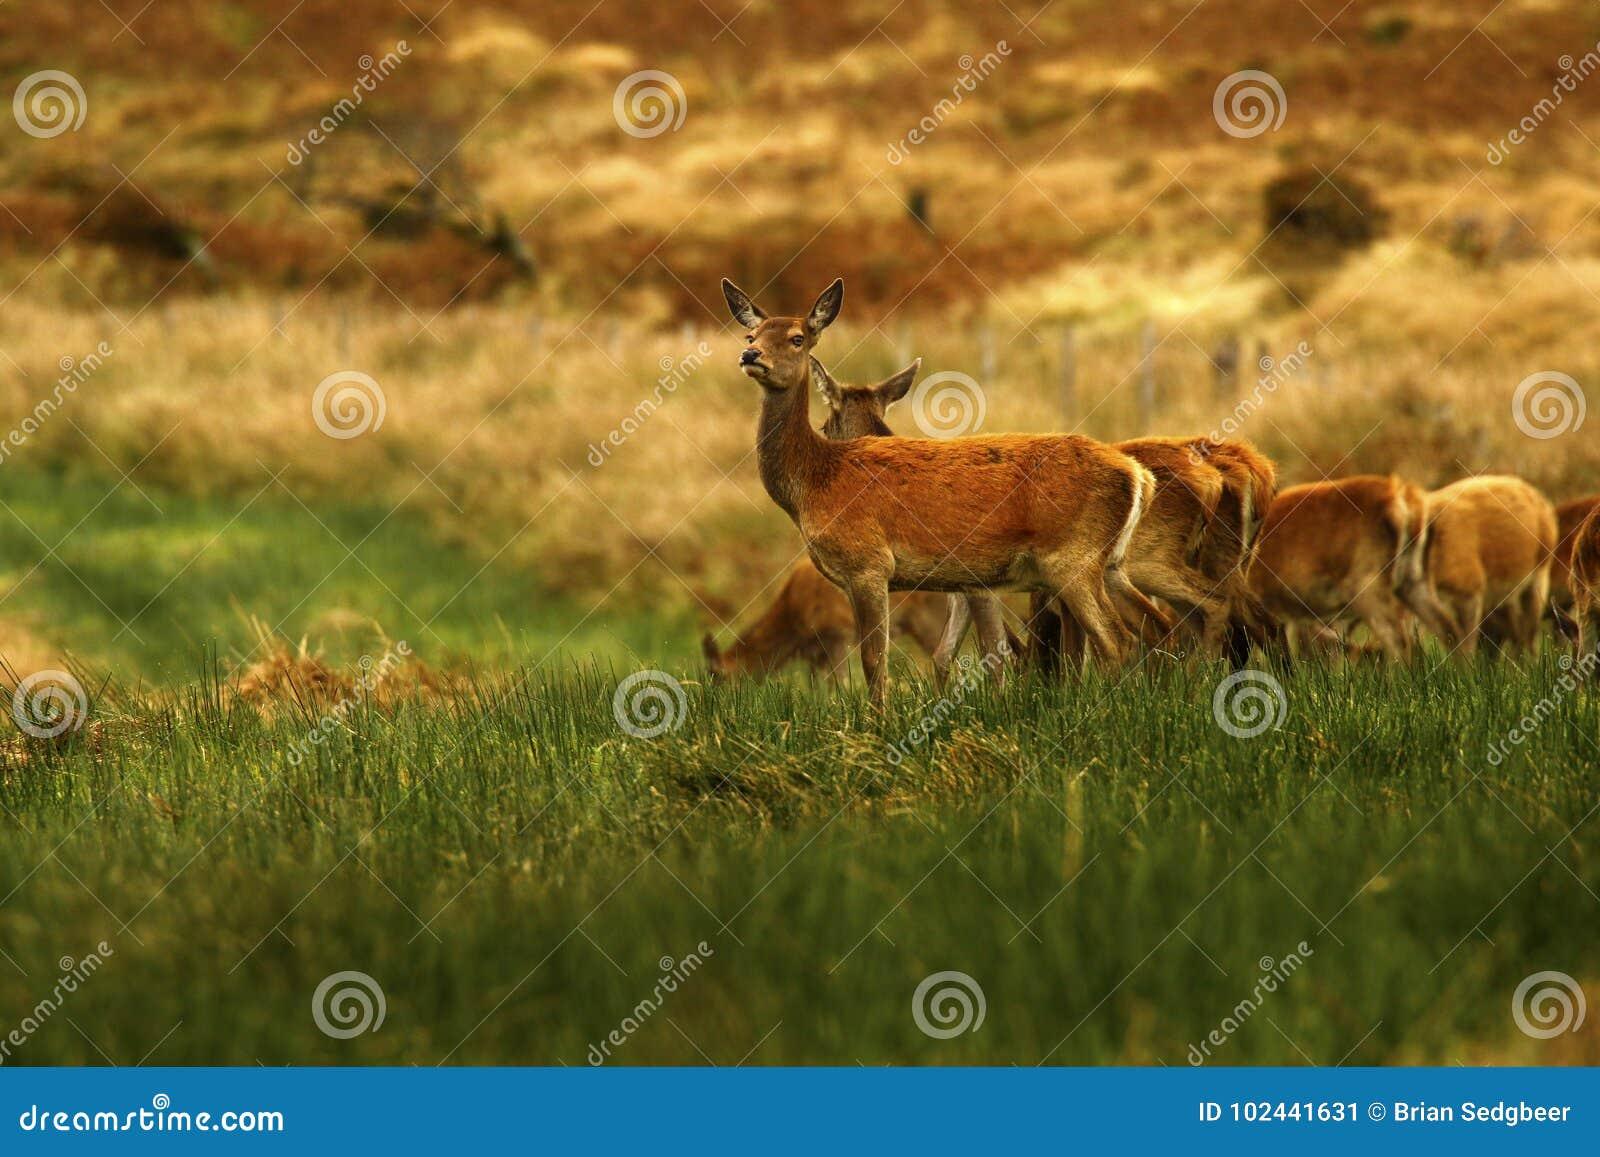 Big Herd of Red Deer during the rut